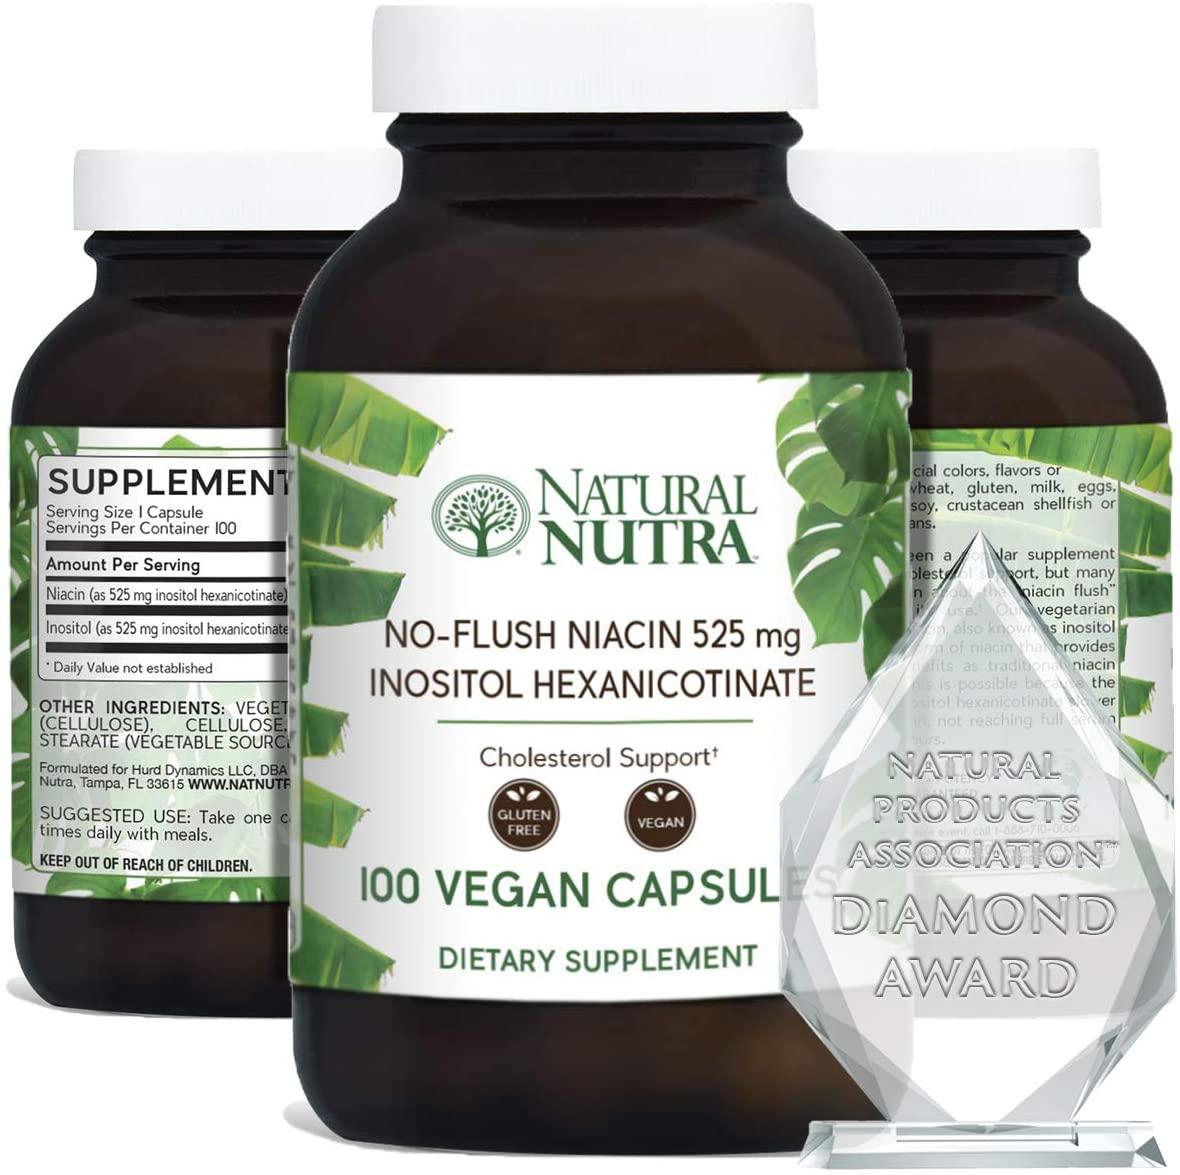 Natural Nutra No Flush Niacin (Vitamin B3) (Inositol Hexanicotinate Niacinate), Flush Free, 525 mg, 100 Vegan and Vegetarian Capsules